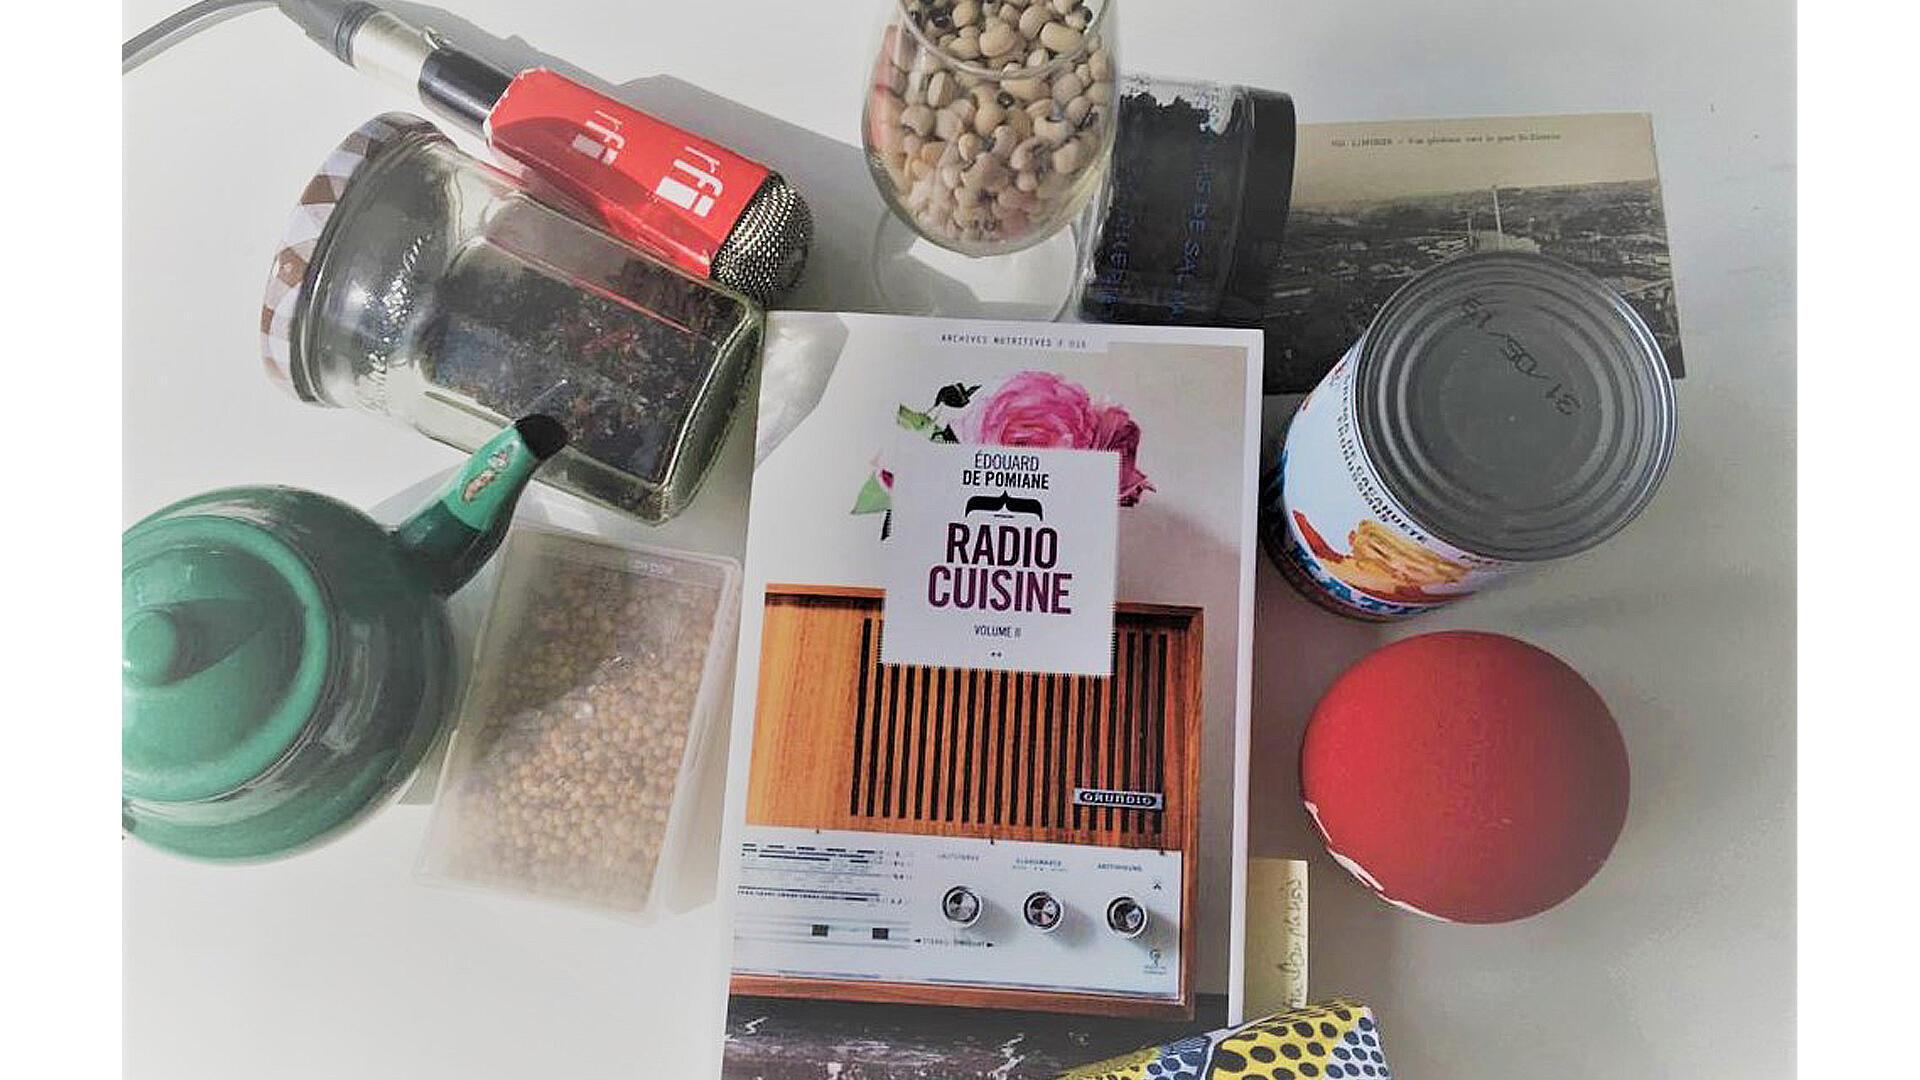 Radio Cuisine _ Le Goût du monde RFI - fête de la radio - 5 juin 2021